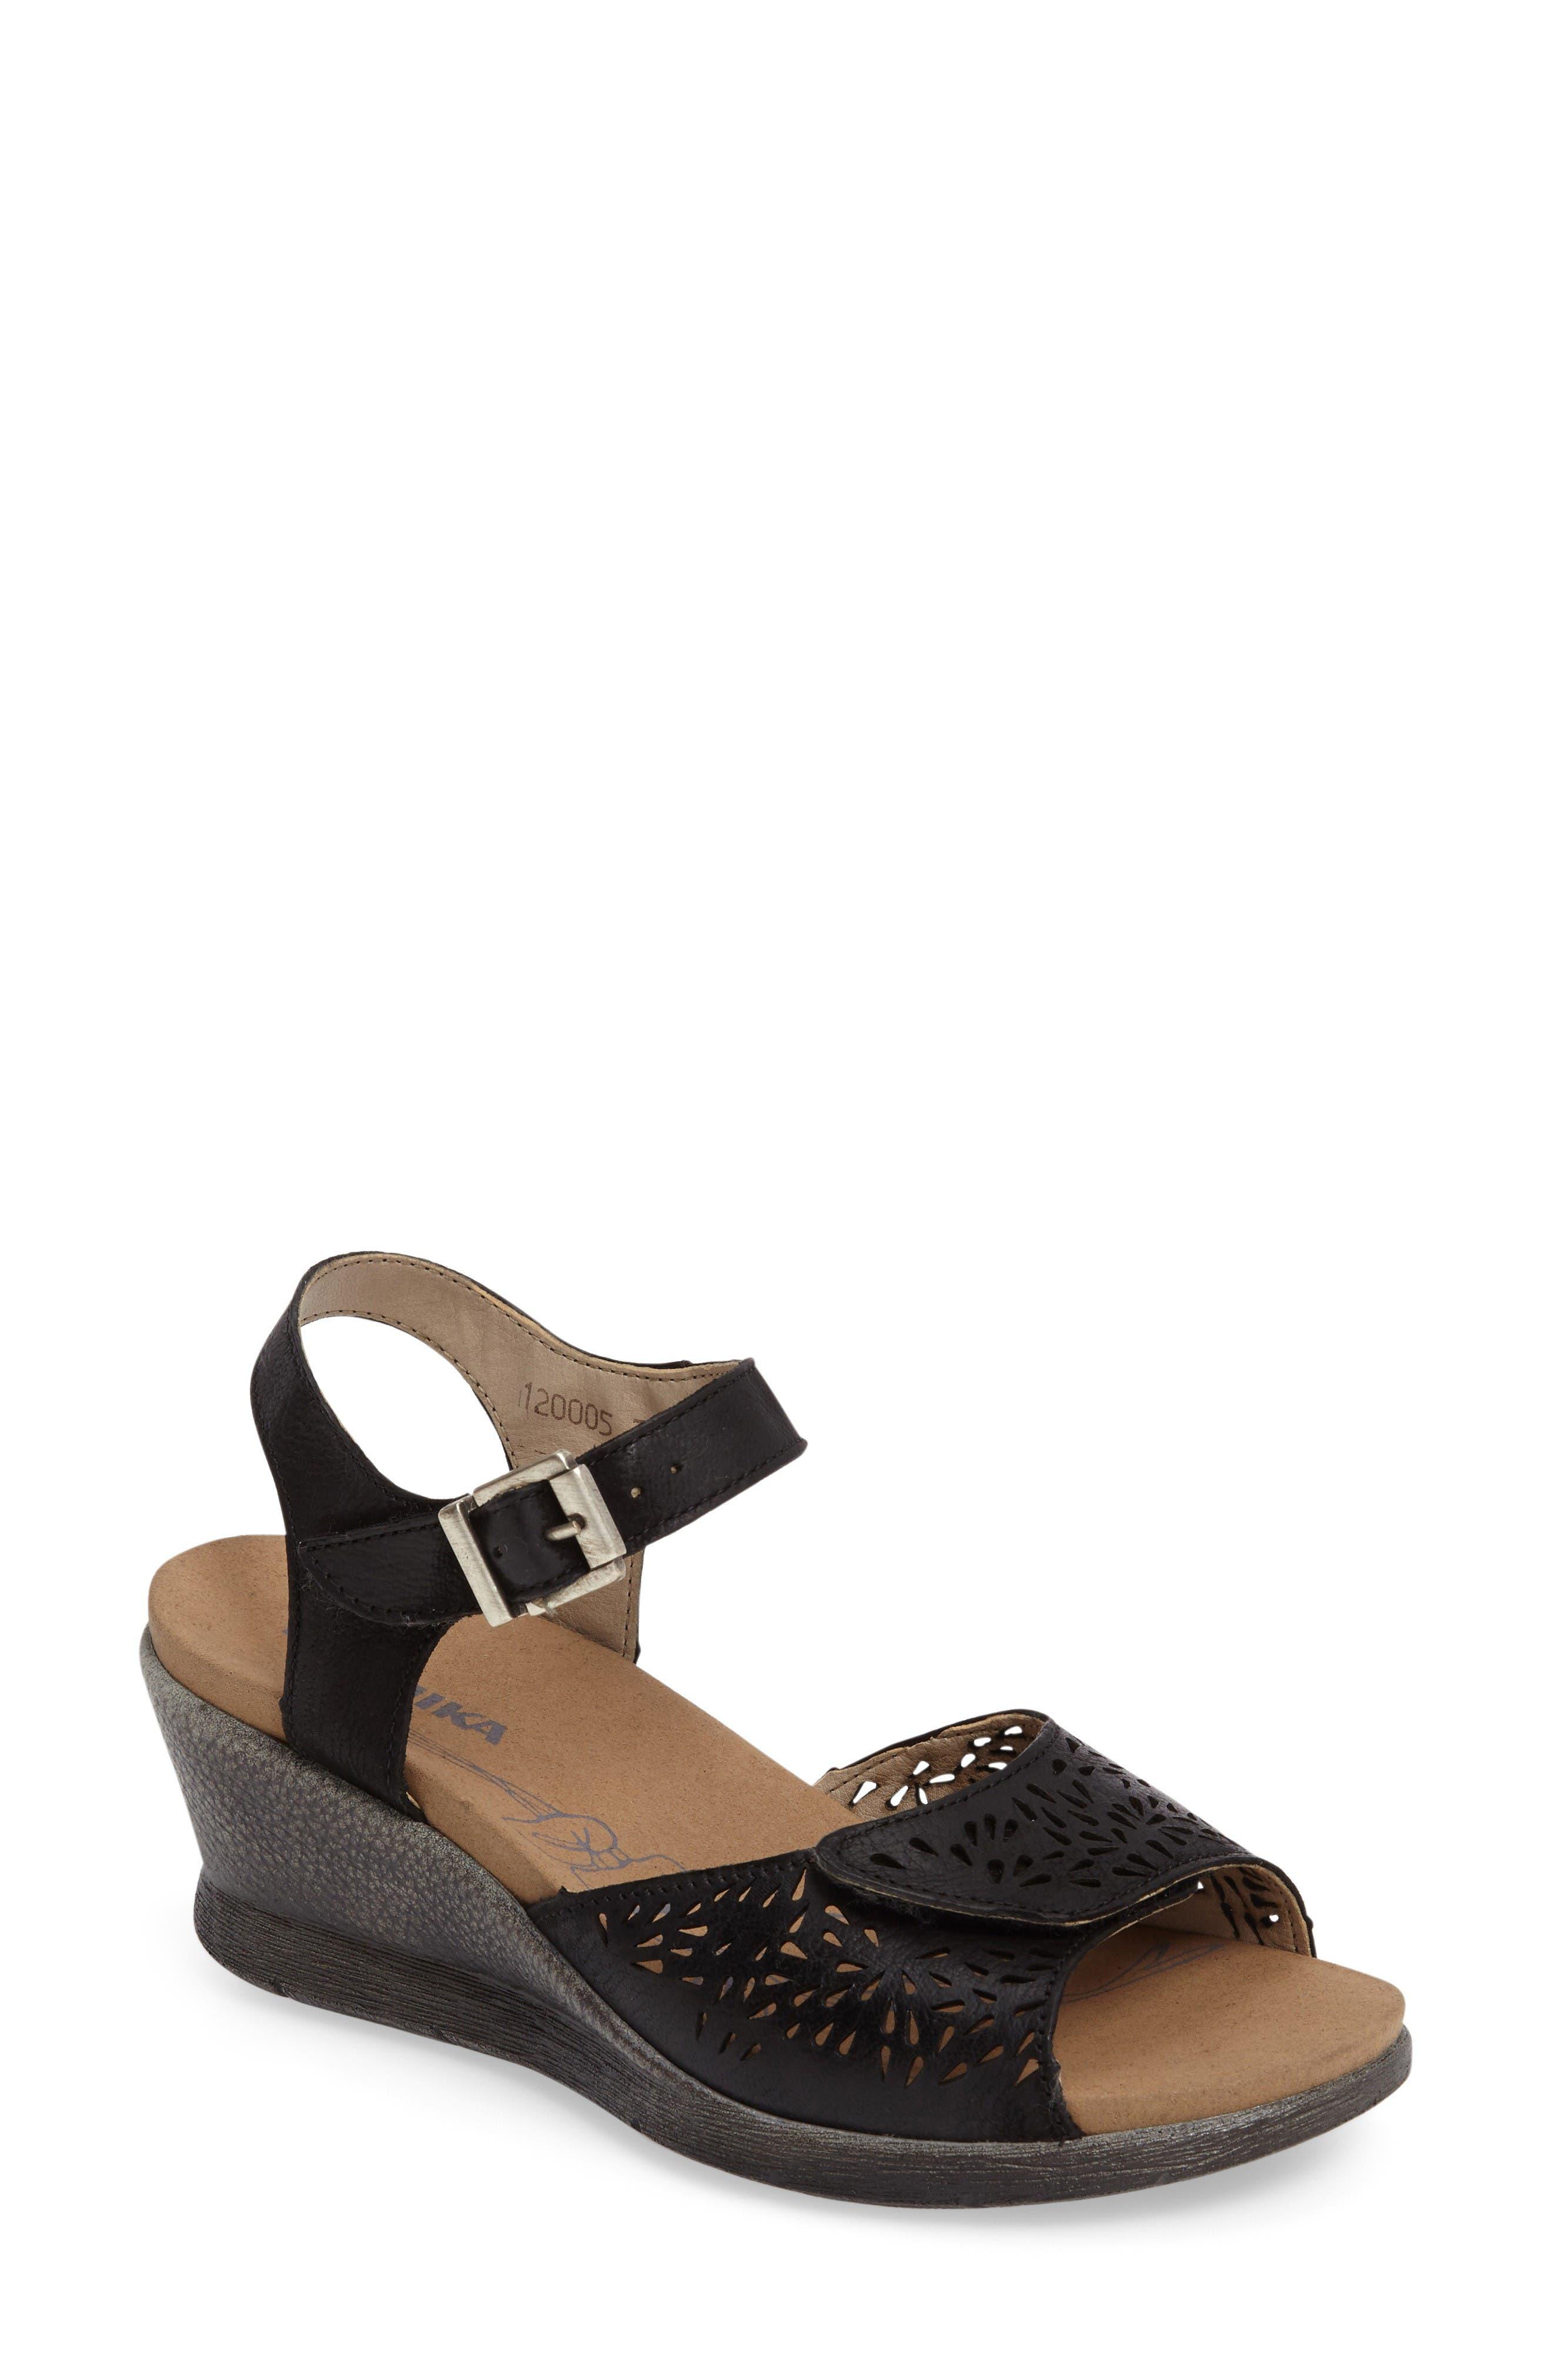 Main Image - Romika® Nevis 05 Sandal (Women)